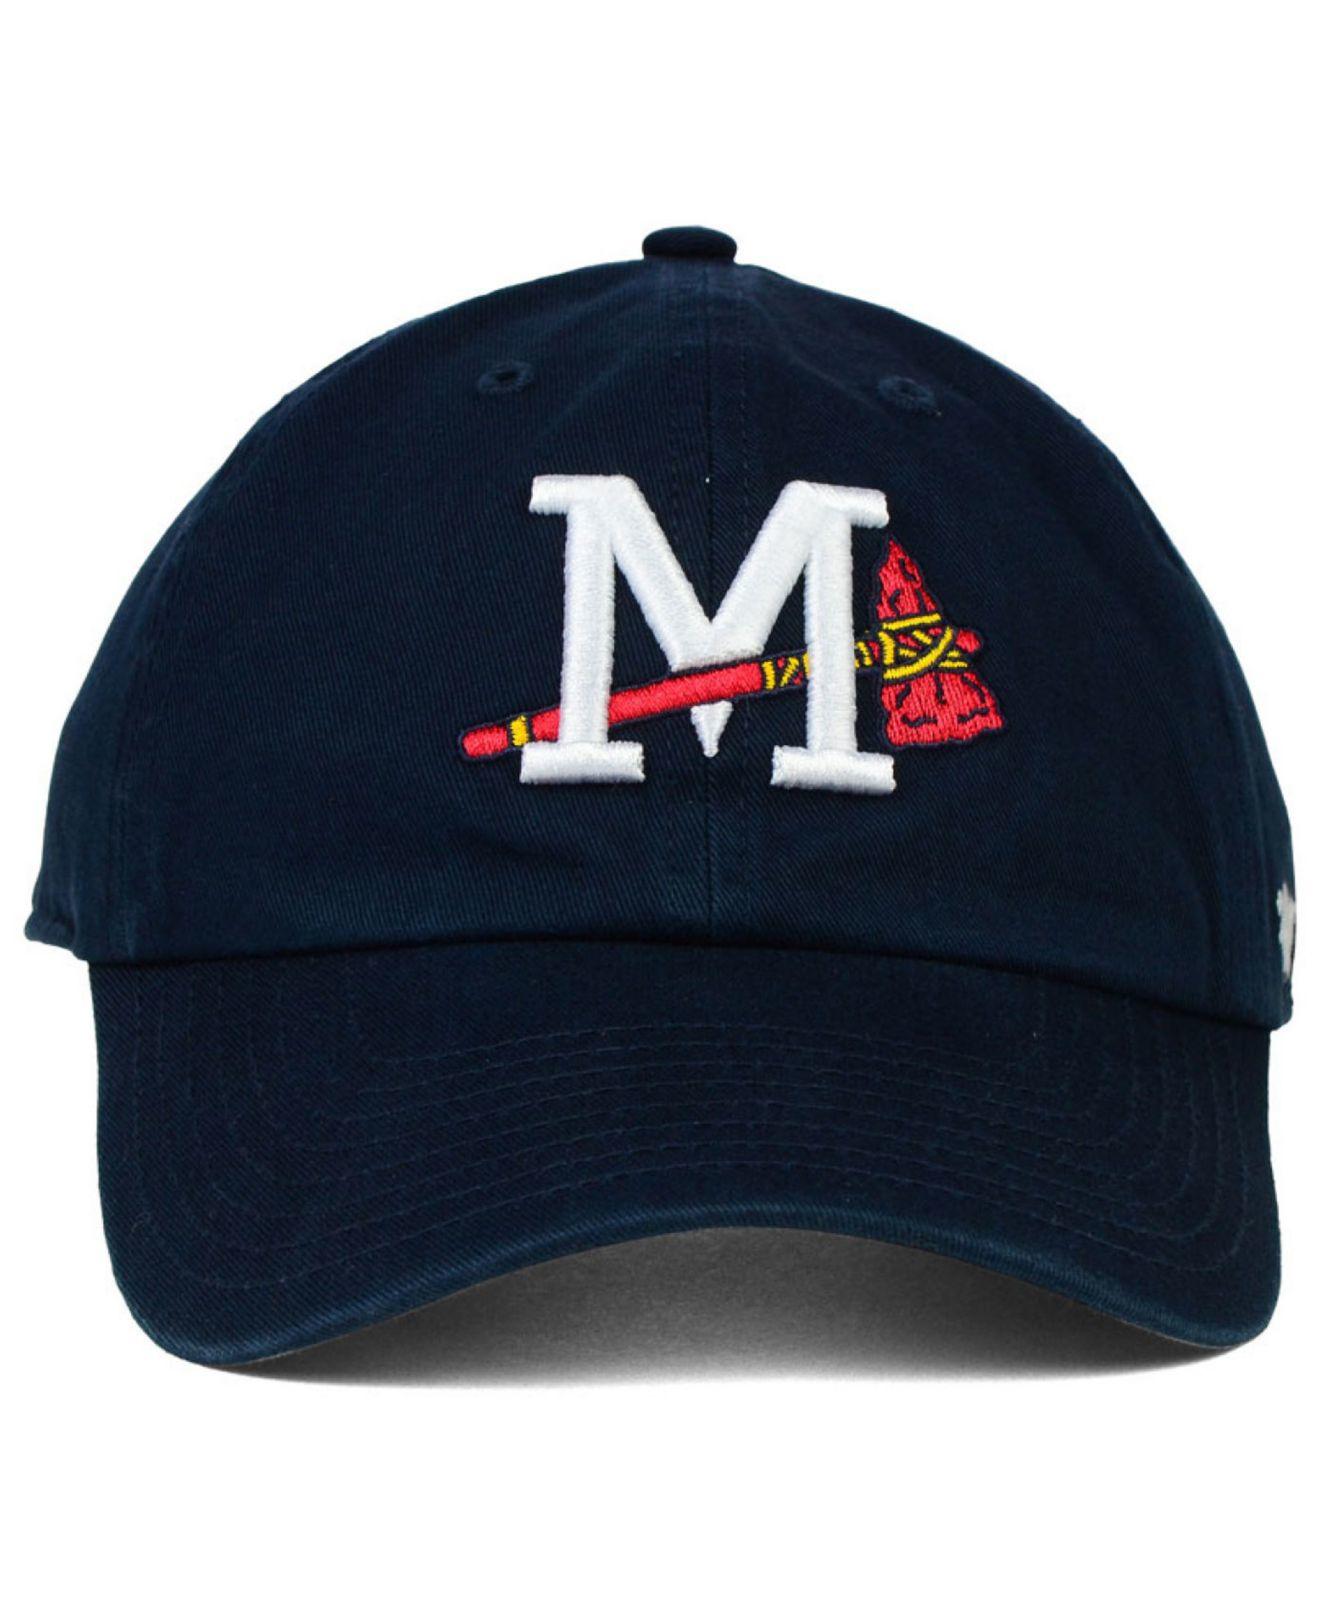 79af91f85de canada lyst 47 brand mississippi braves clean up cap in blue for men 4f2a7  4b708